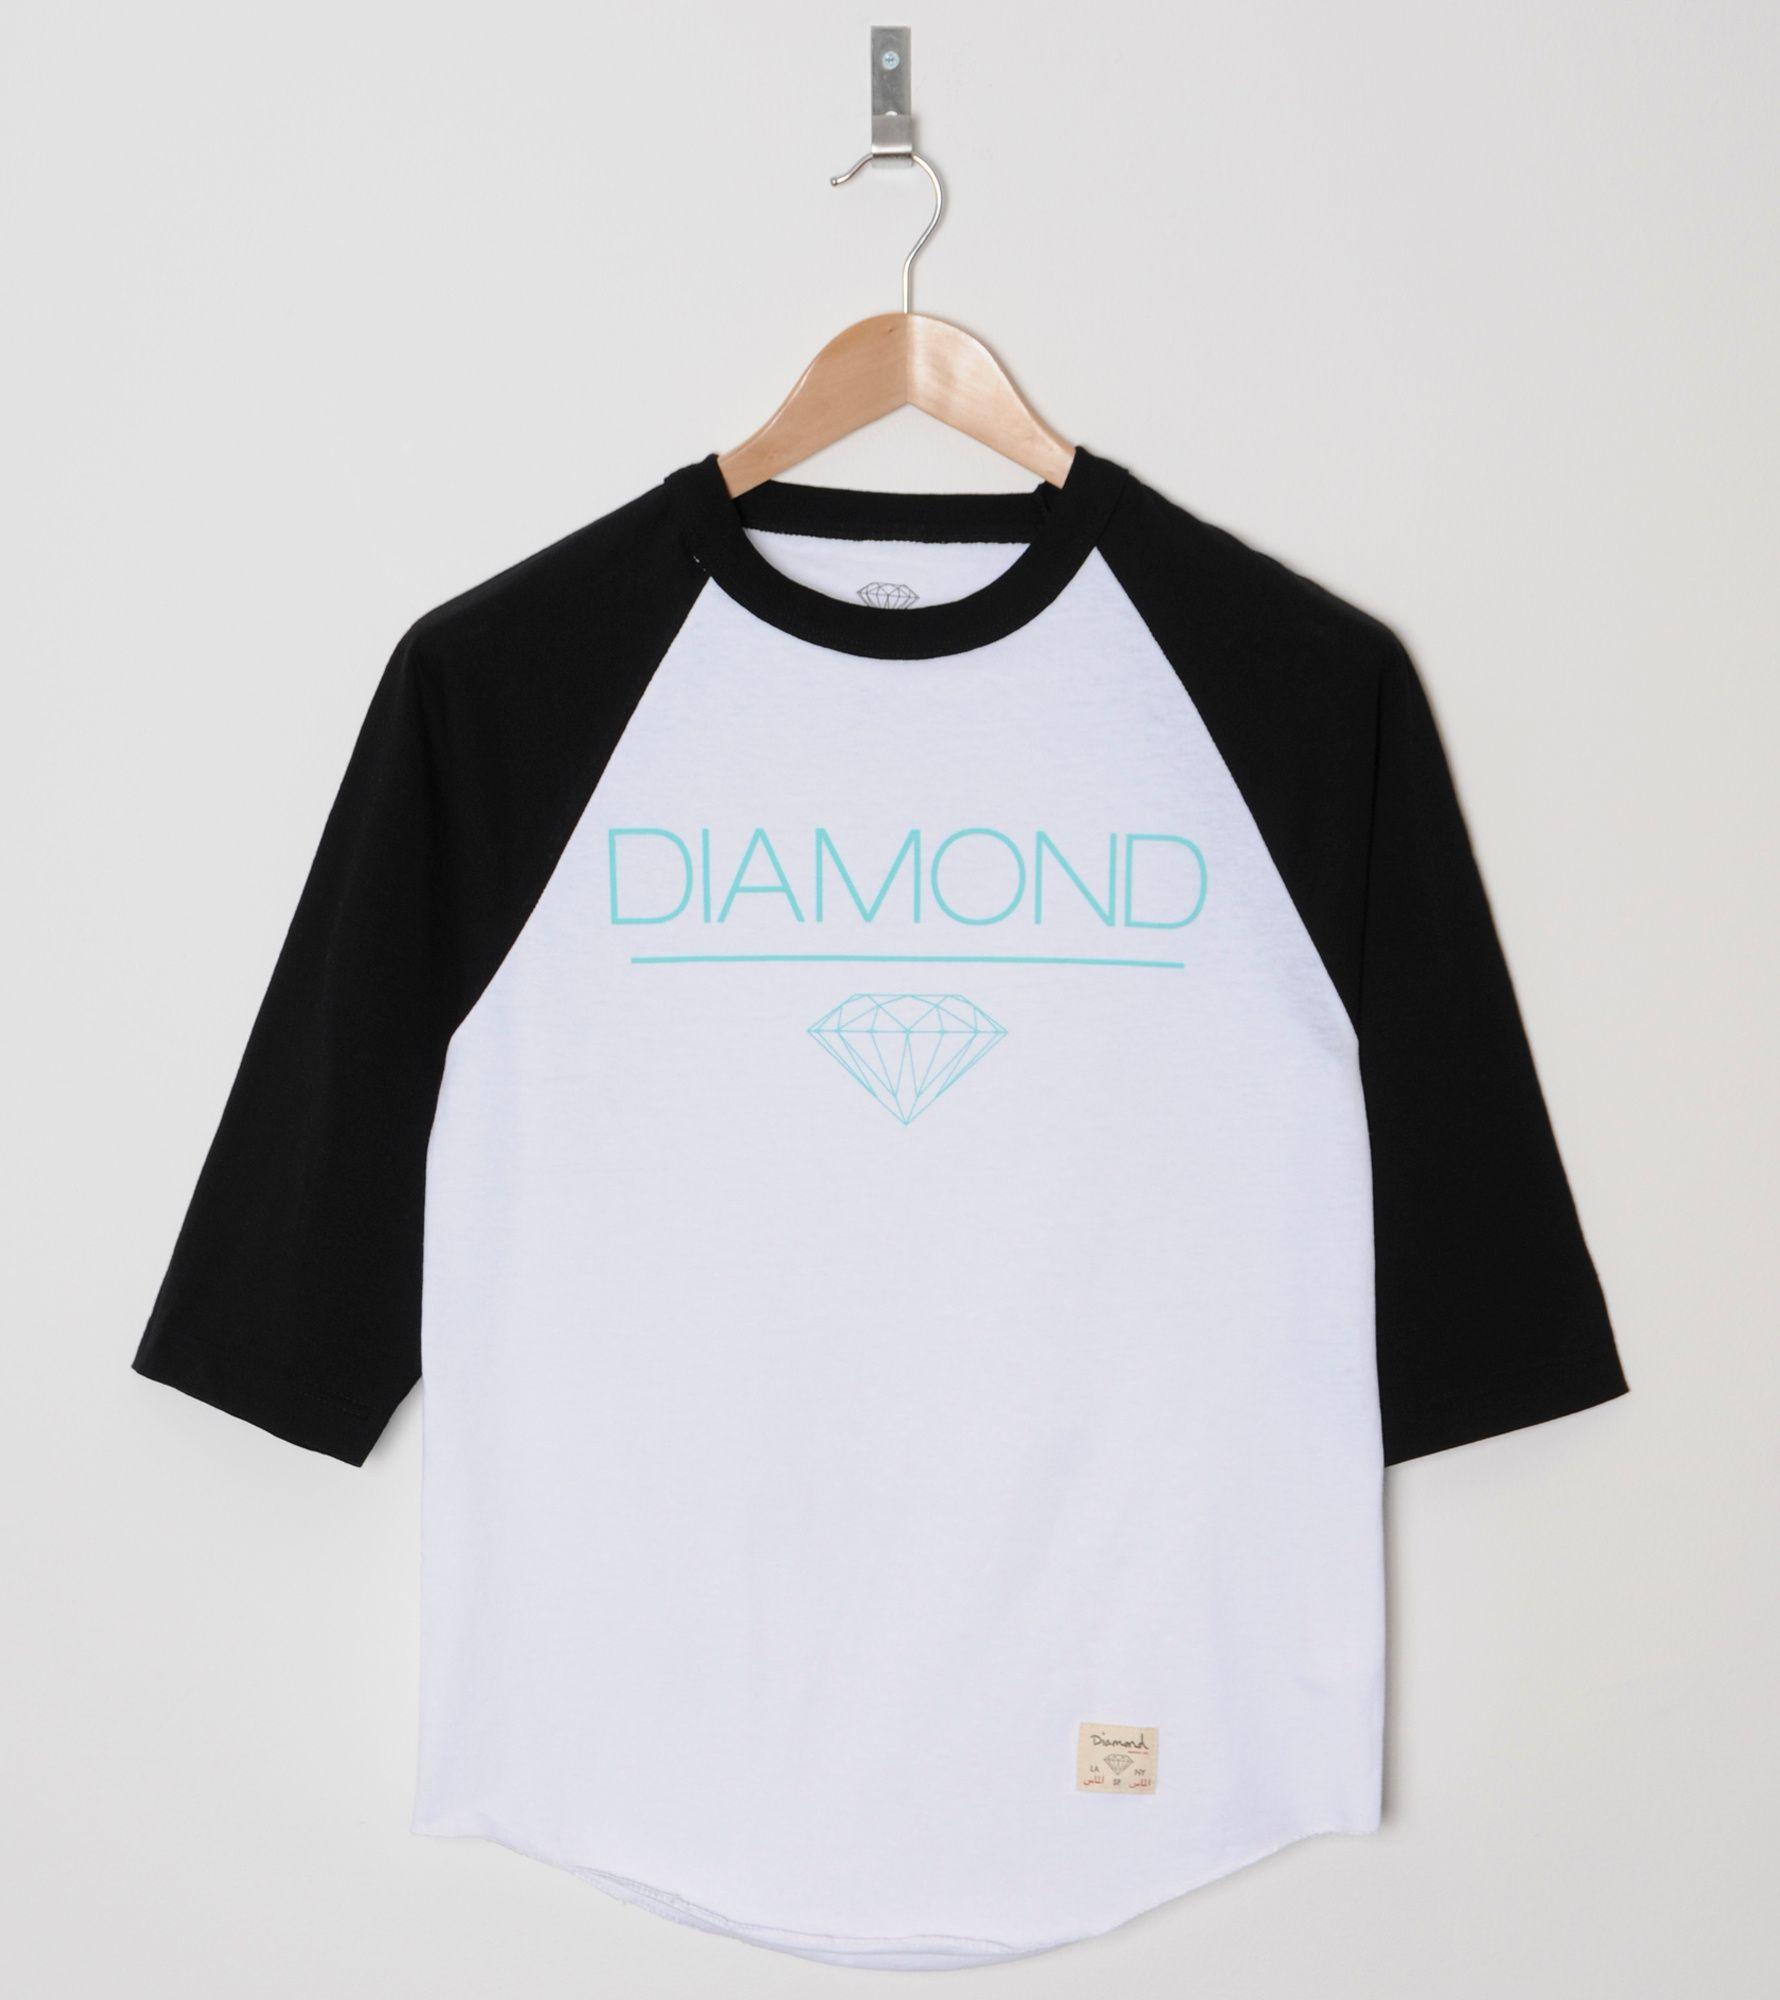 Diamond supply whitespace raglan t shirt size for Wholesale diamond supply co shirts